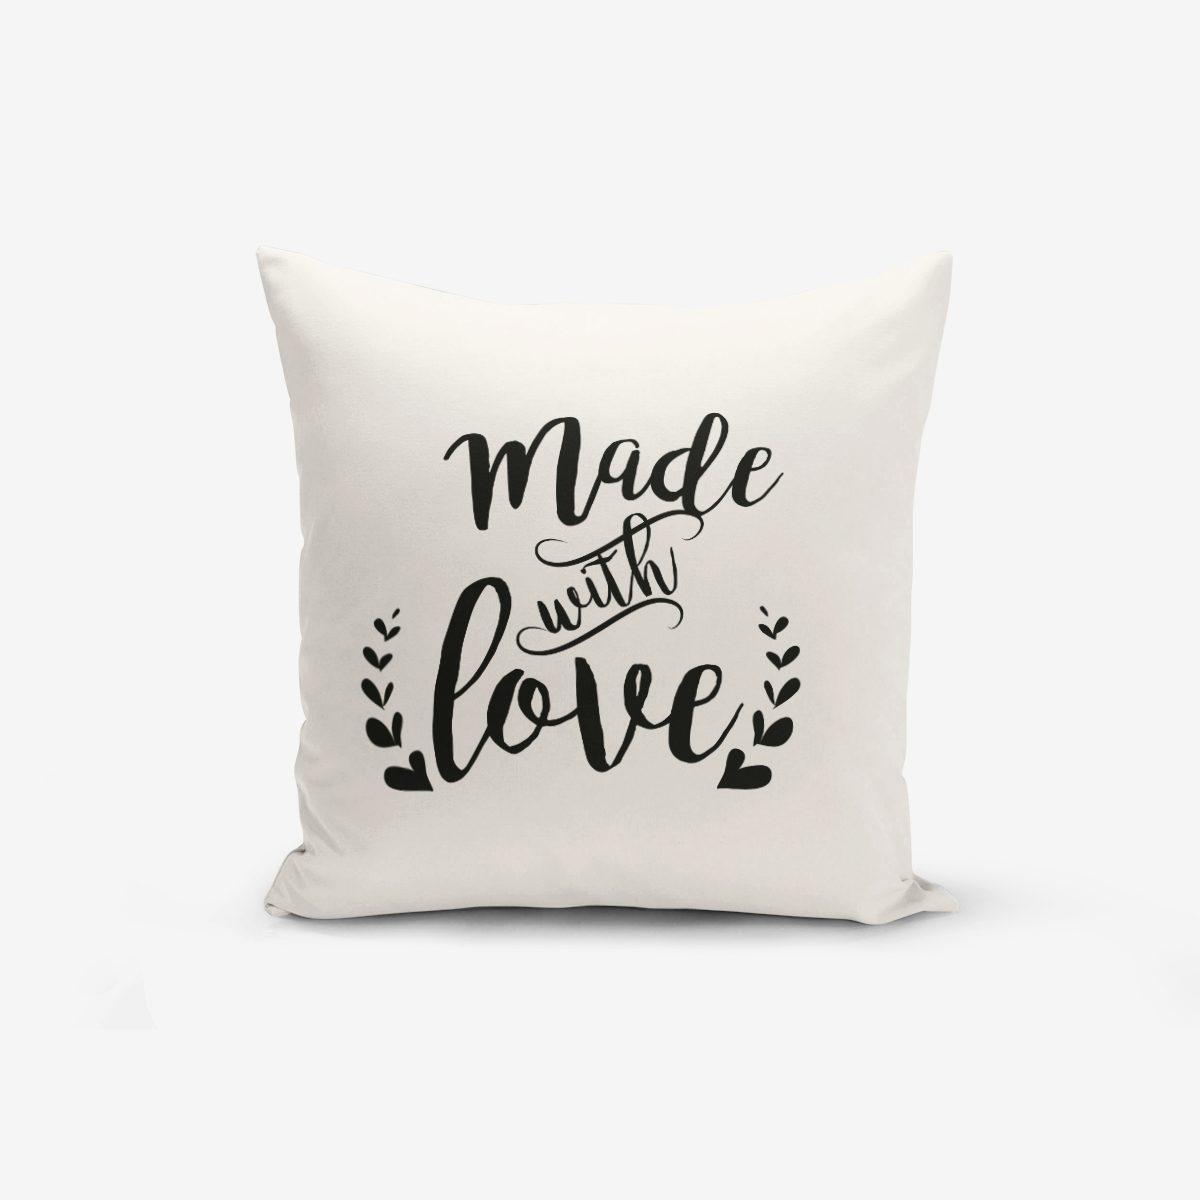 Made With Love Yazı Desenli Modern Kırlent Kılıfı Realhomes